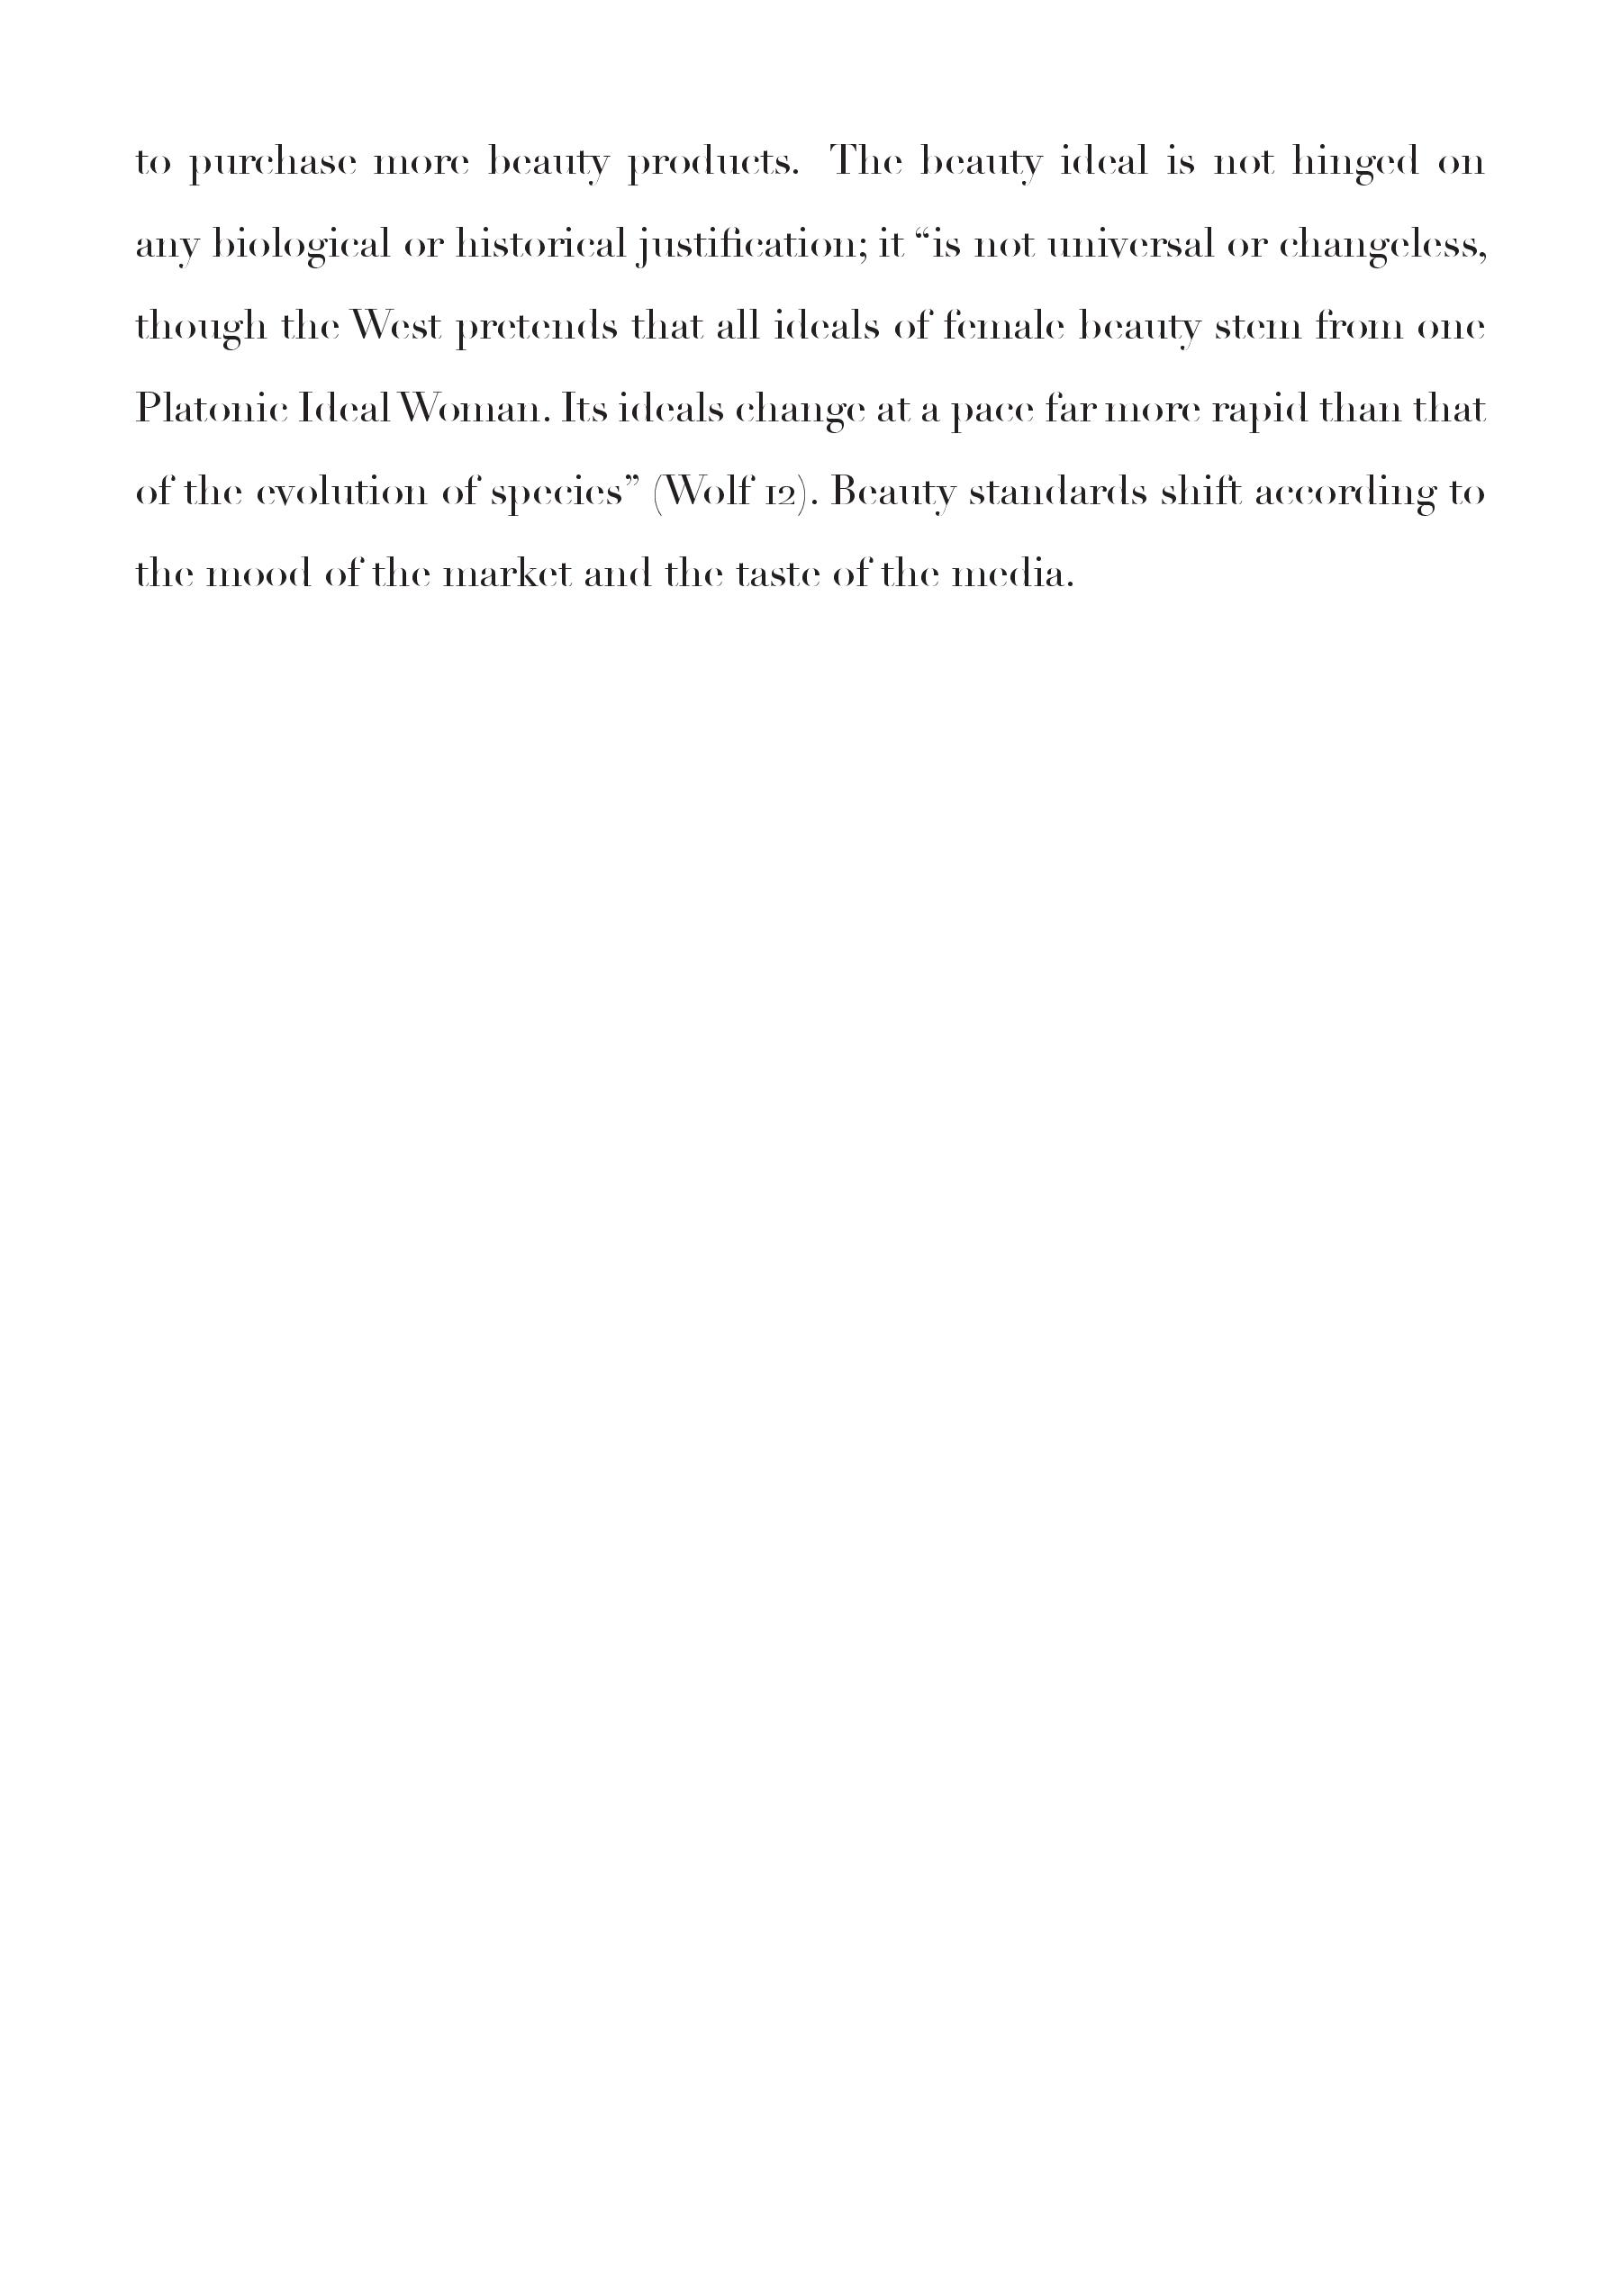 SkinDeep-page-034.jpg